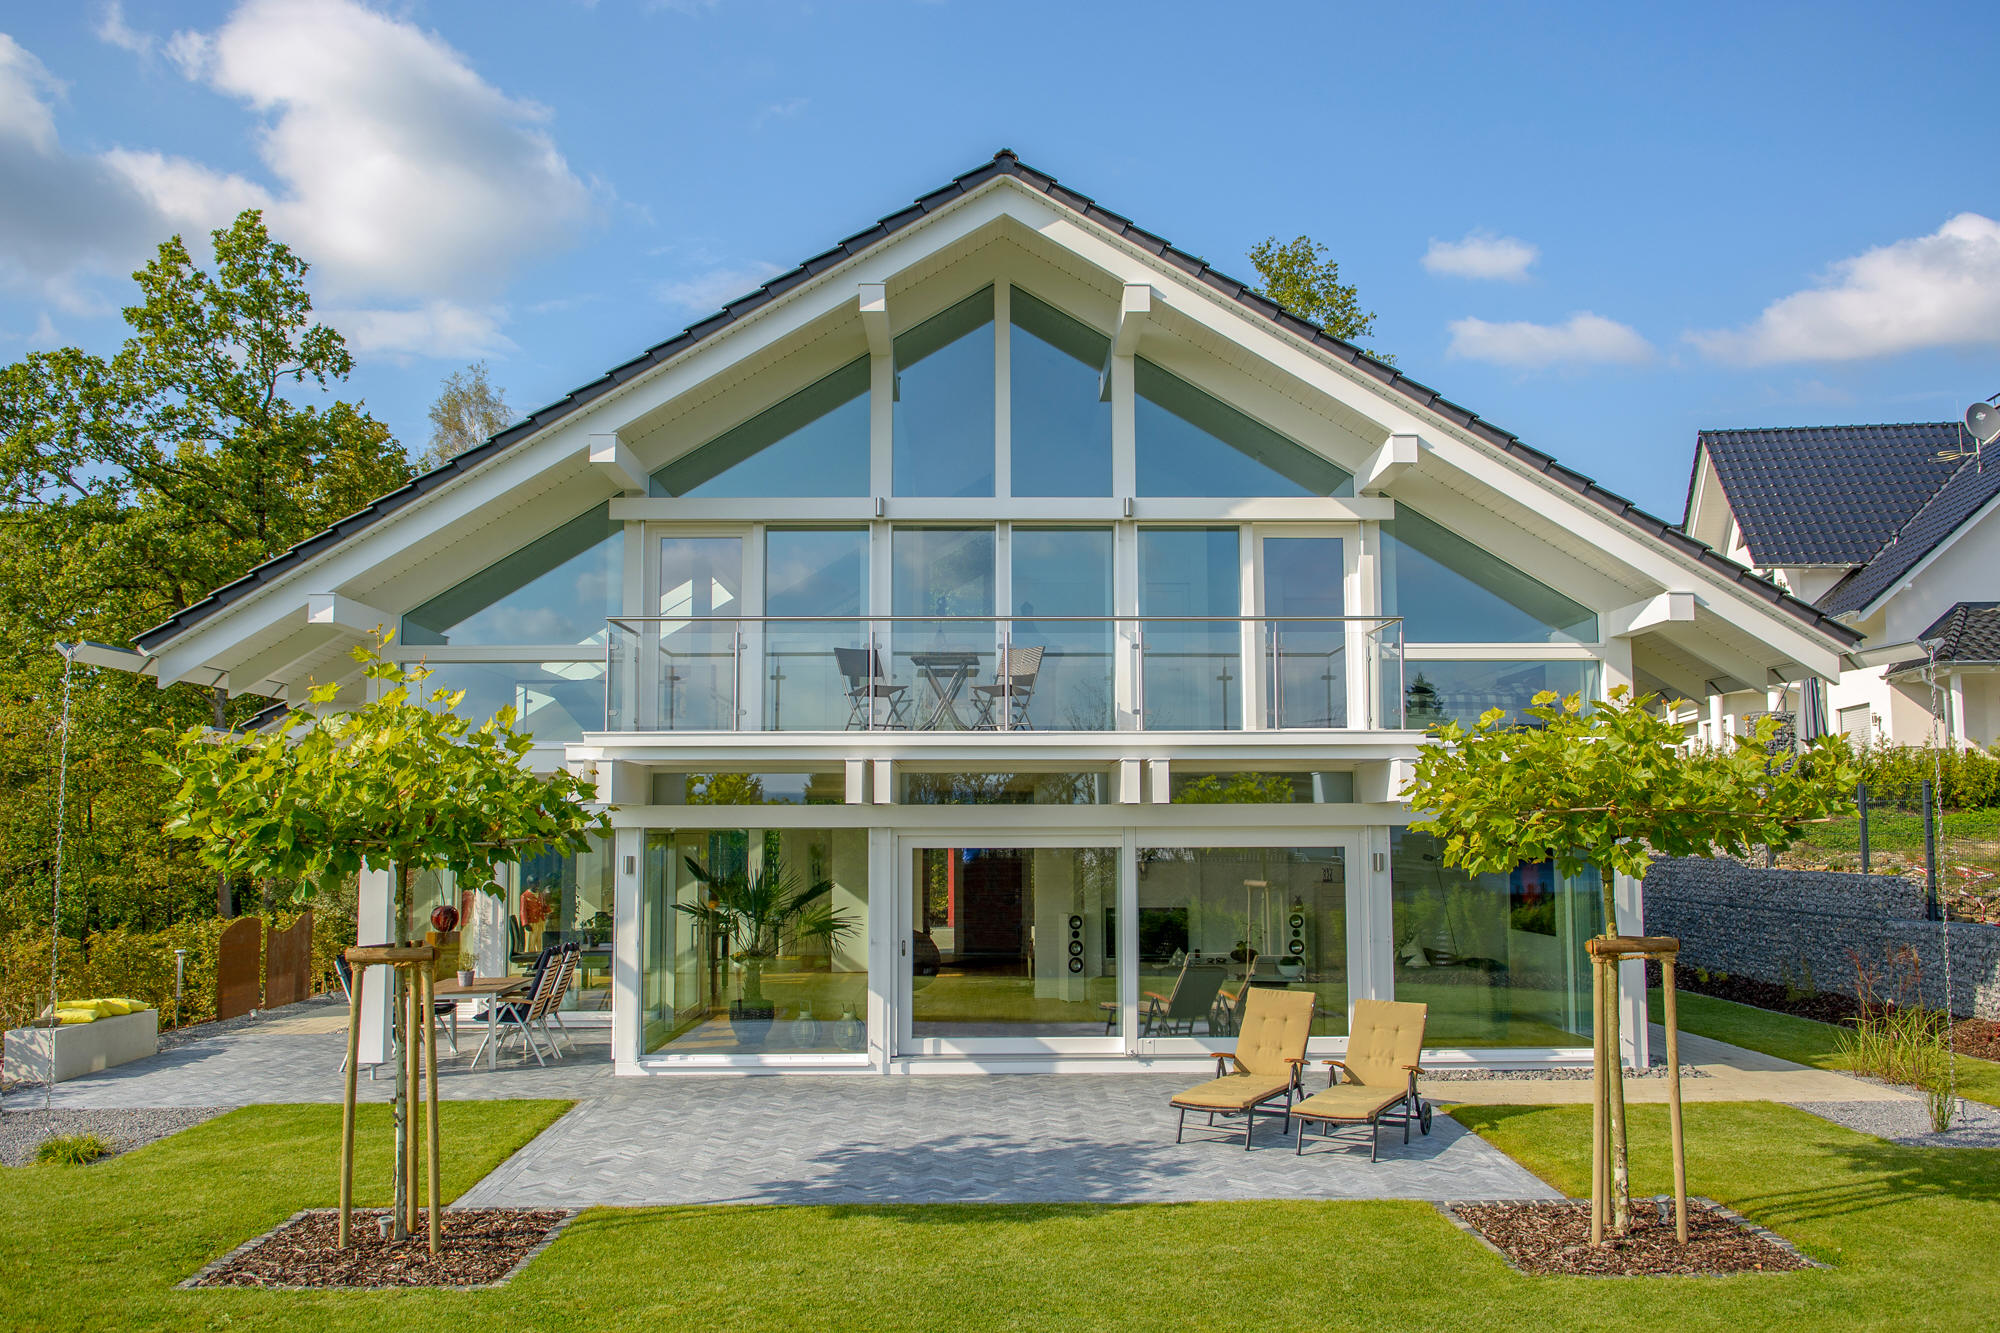 Modernes Holzskeletthaus KD 244 - KD Haus